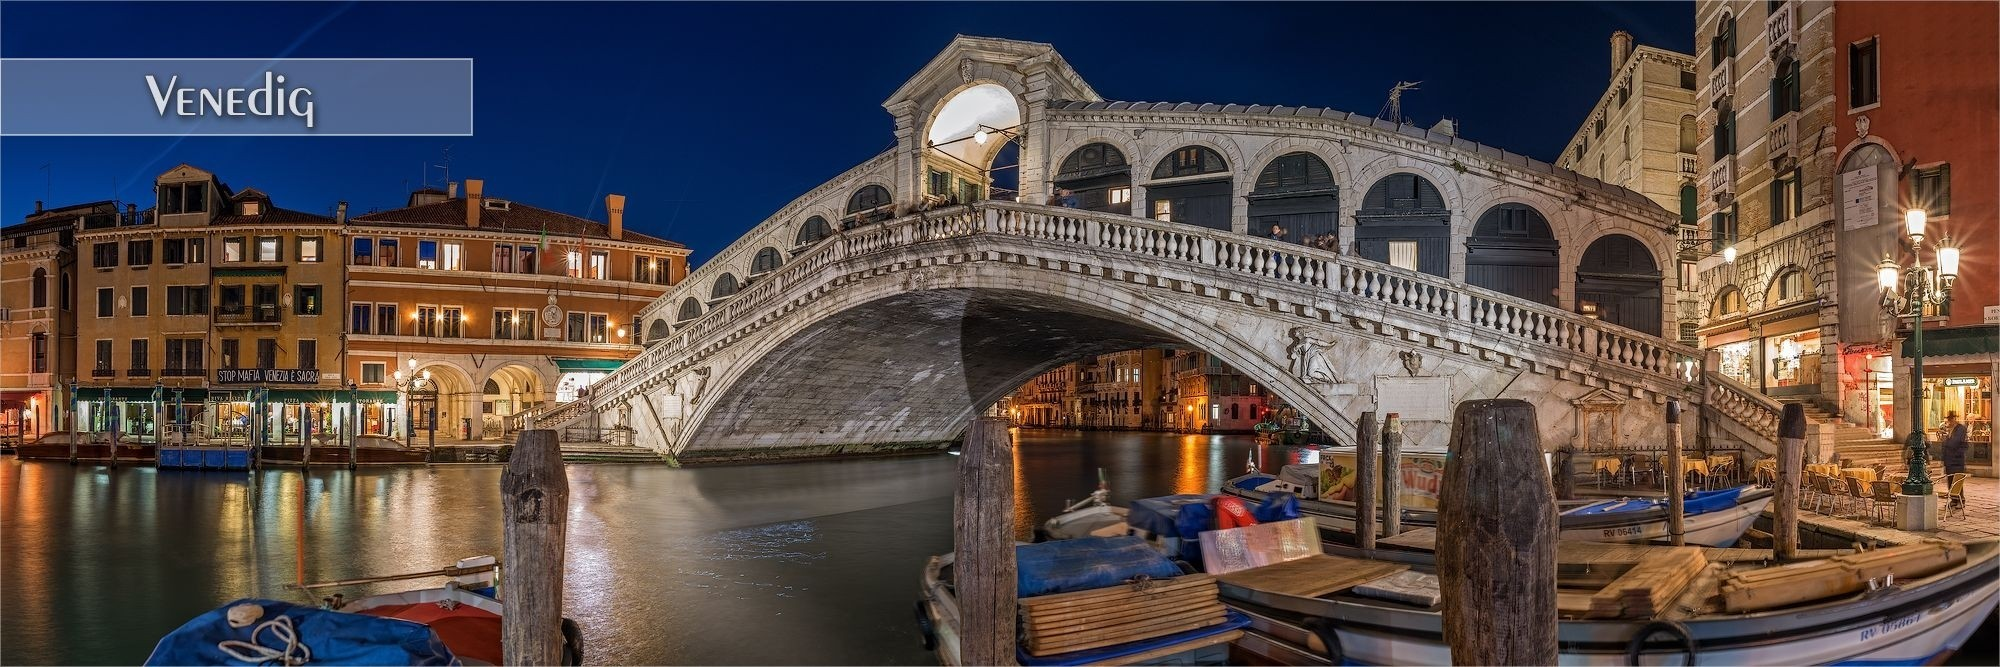 Bilder aus Venedig als Wandbild oder Küchenrückwand